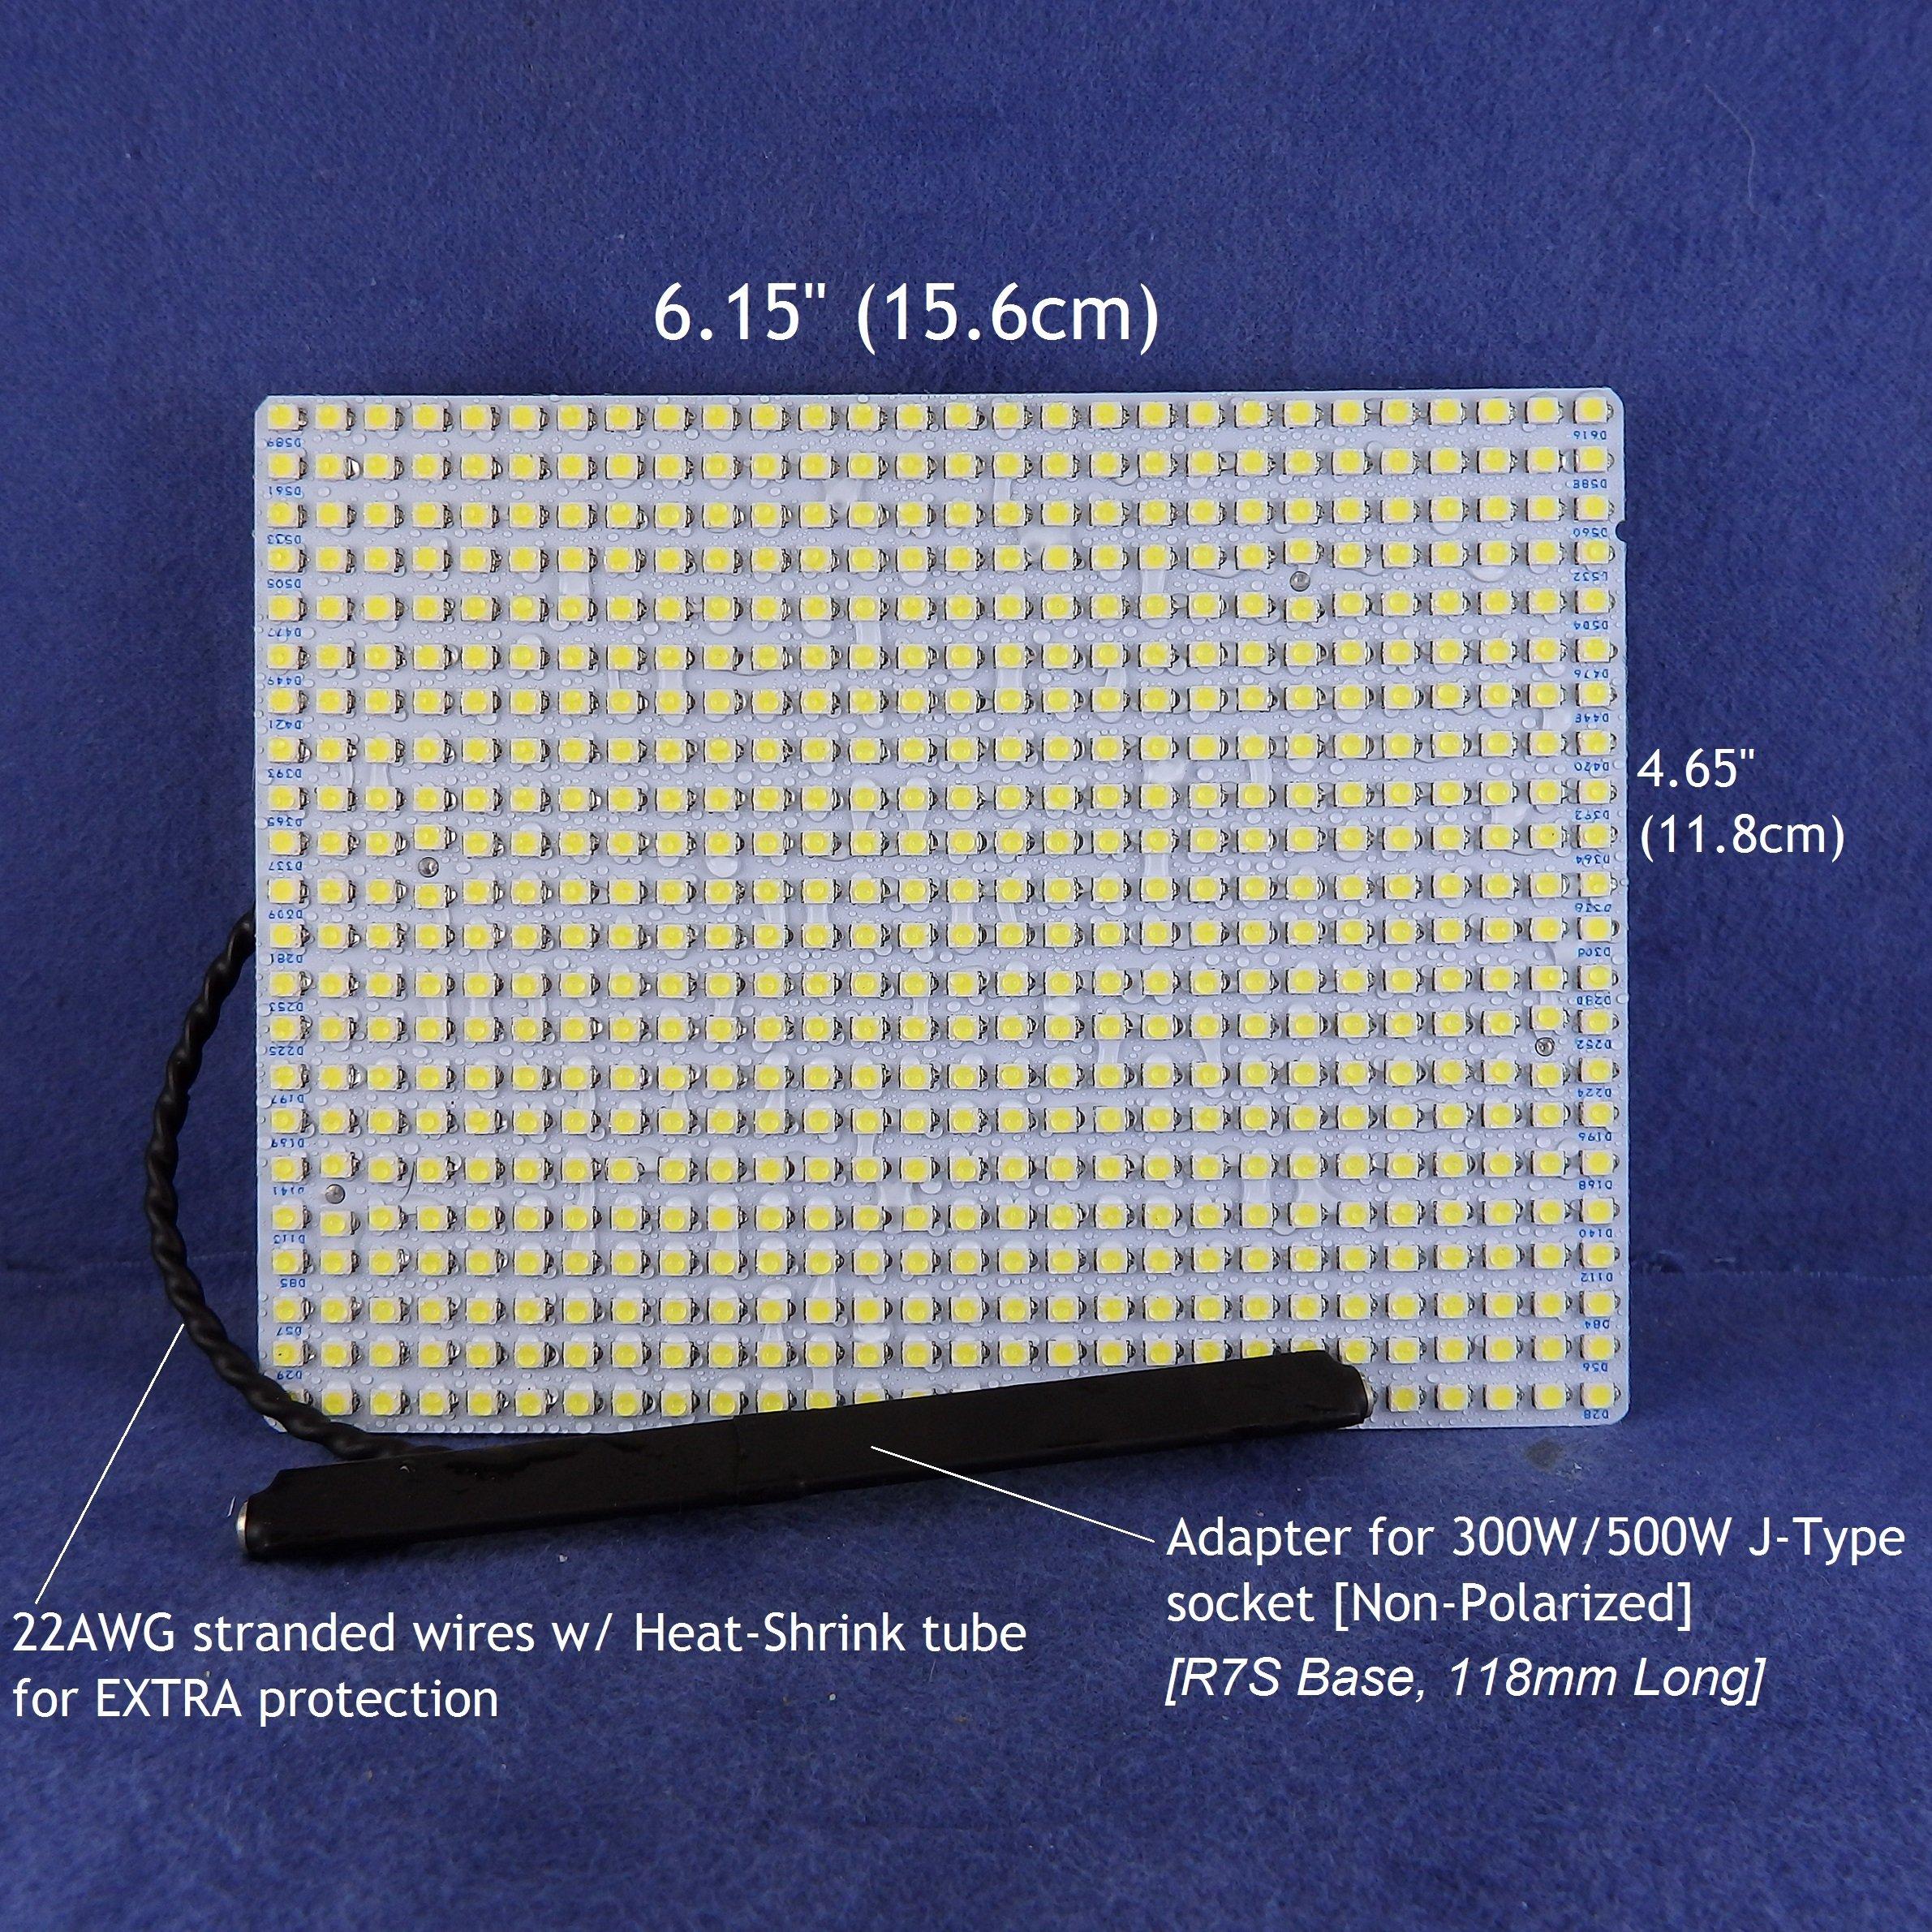 277Vac WATER-RESISTANT LED Light panel for RETROFIT 300W/500W Halogen light fixtures -- 5000Lumens 24Watts -- COOL WHITE (6000K) LED color. P/N: SPTL616LRC-277V